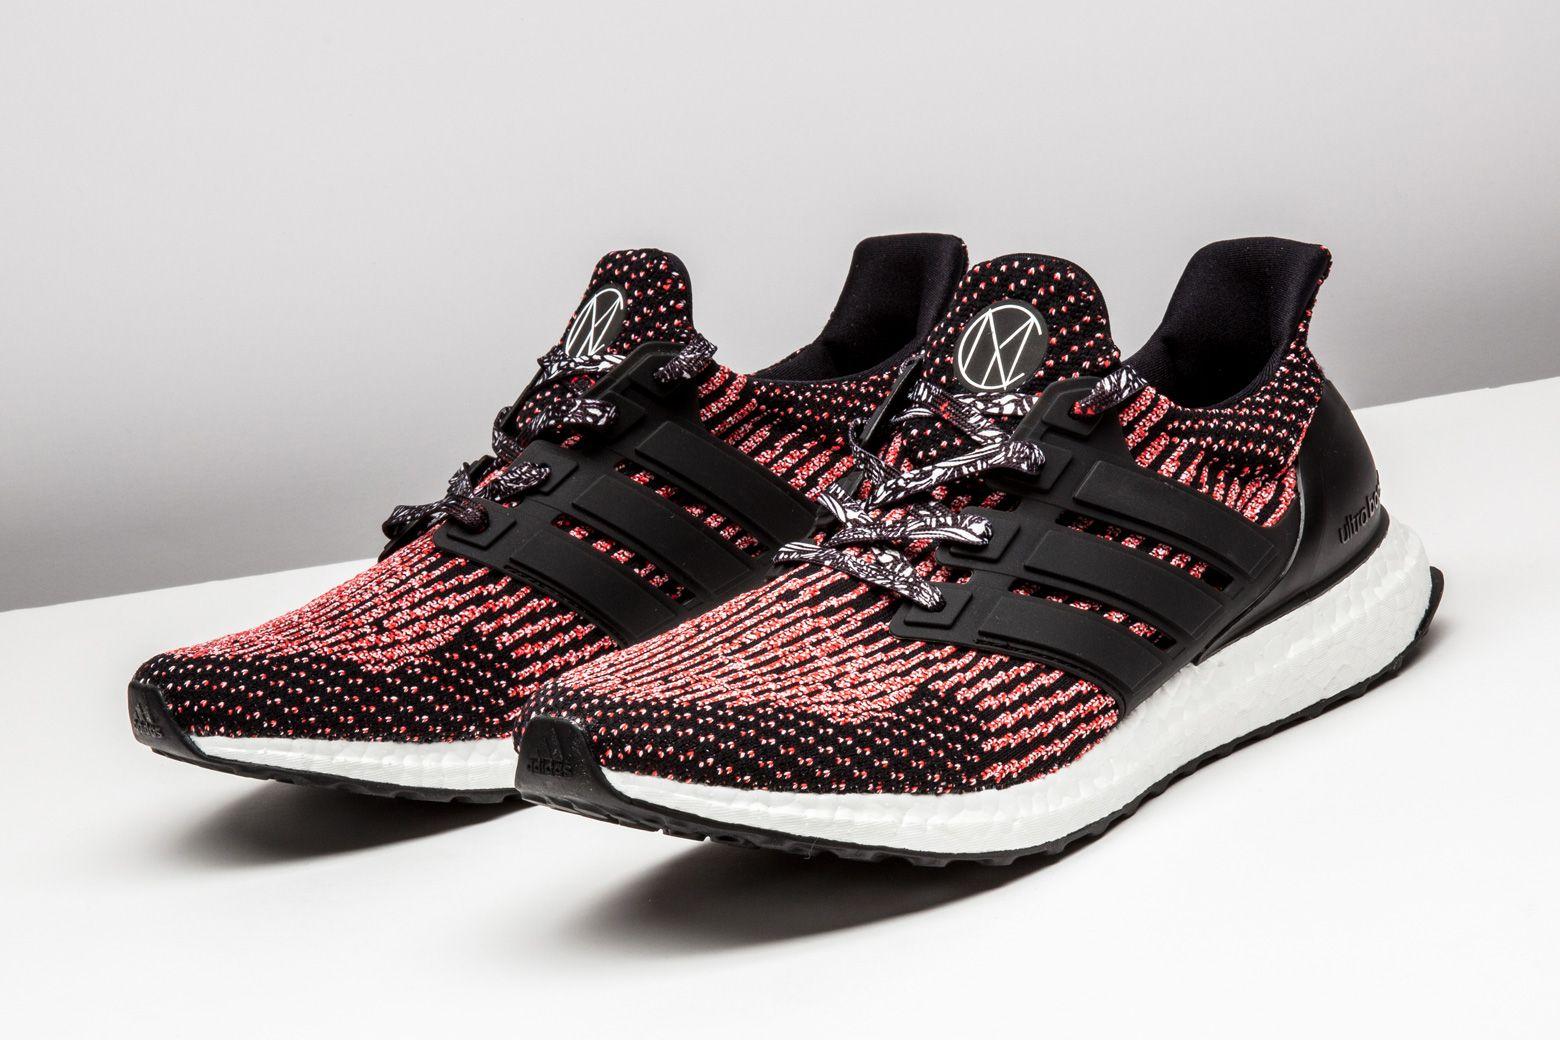 Adidas UltraBOOST CNY \